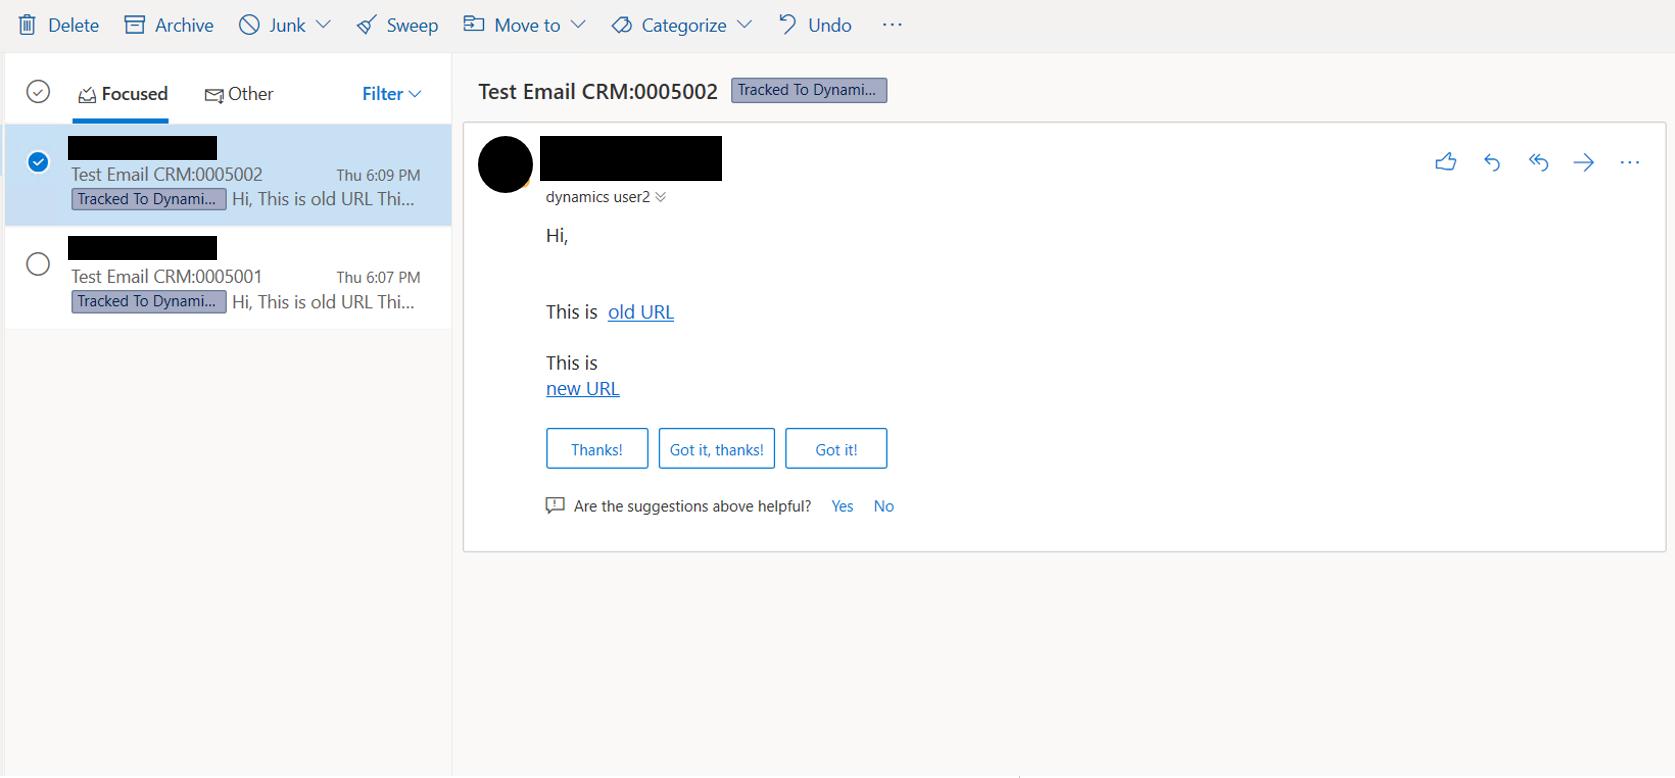 Results dynamics user inbox